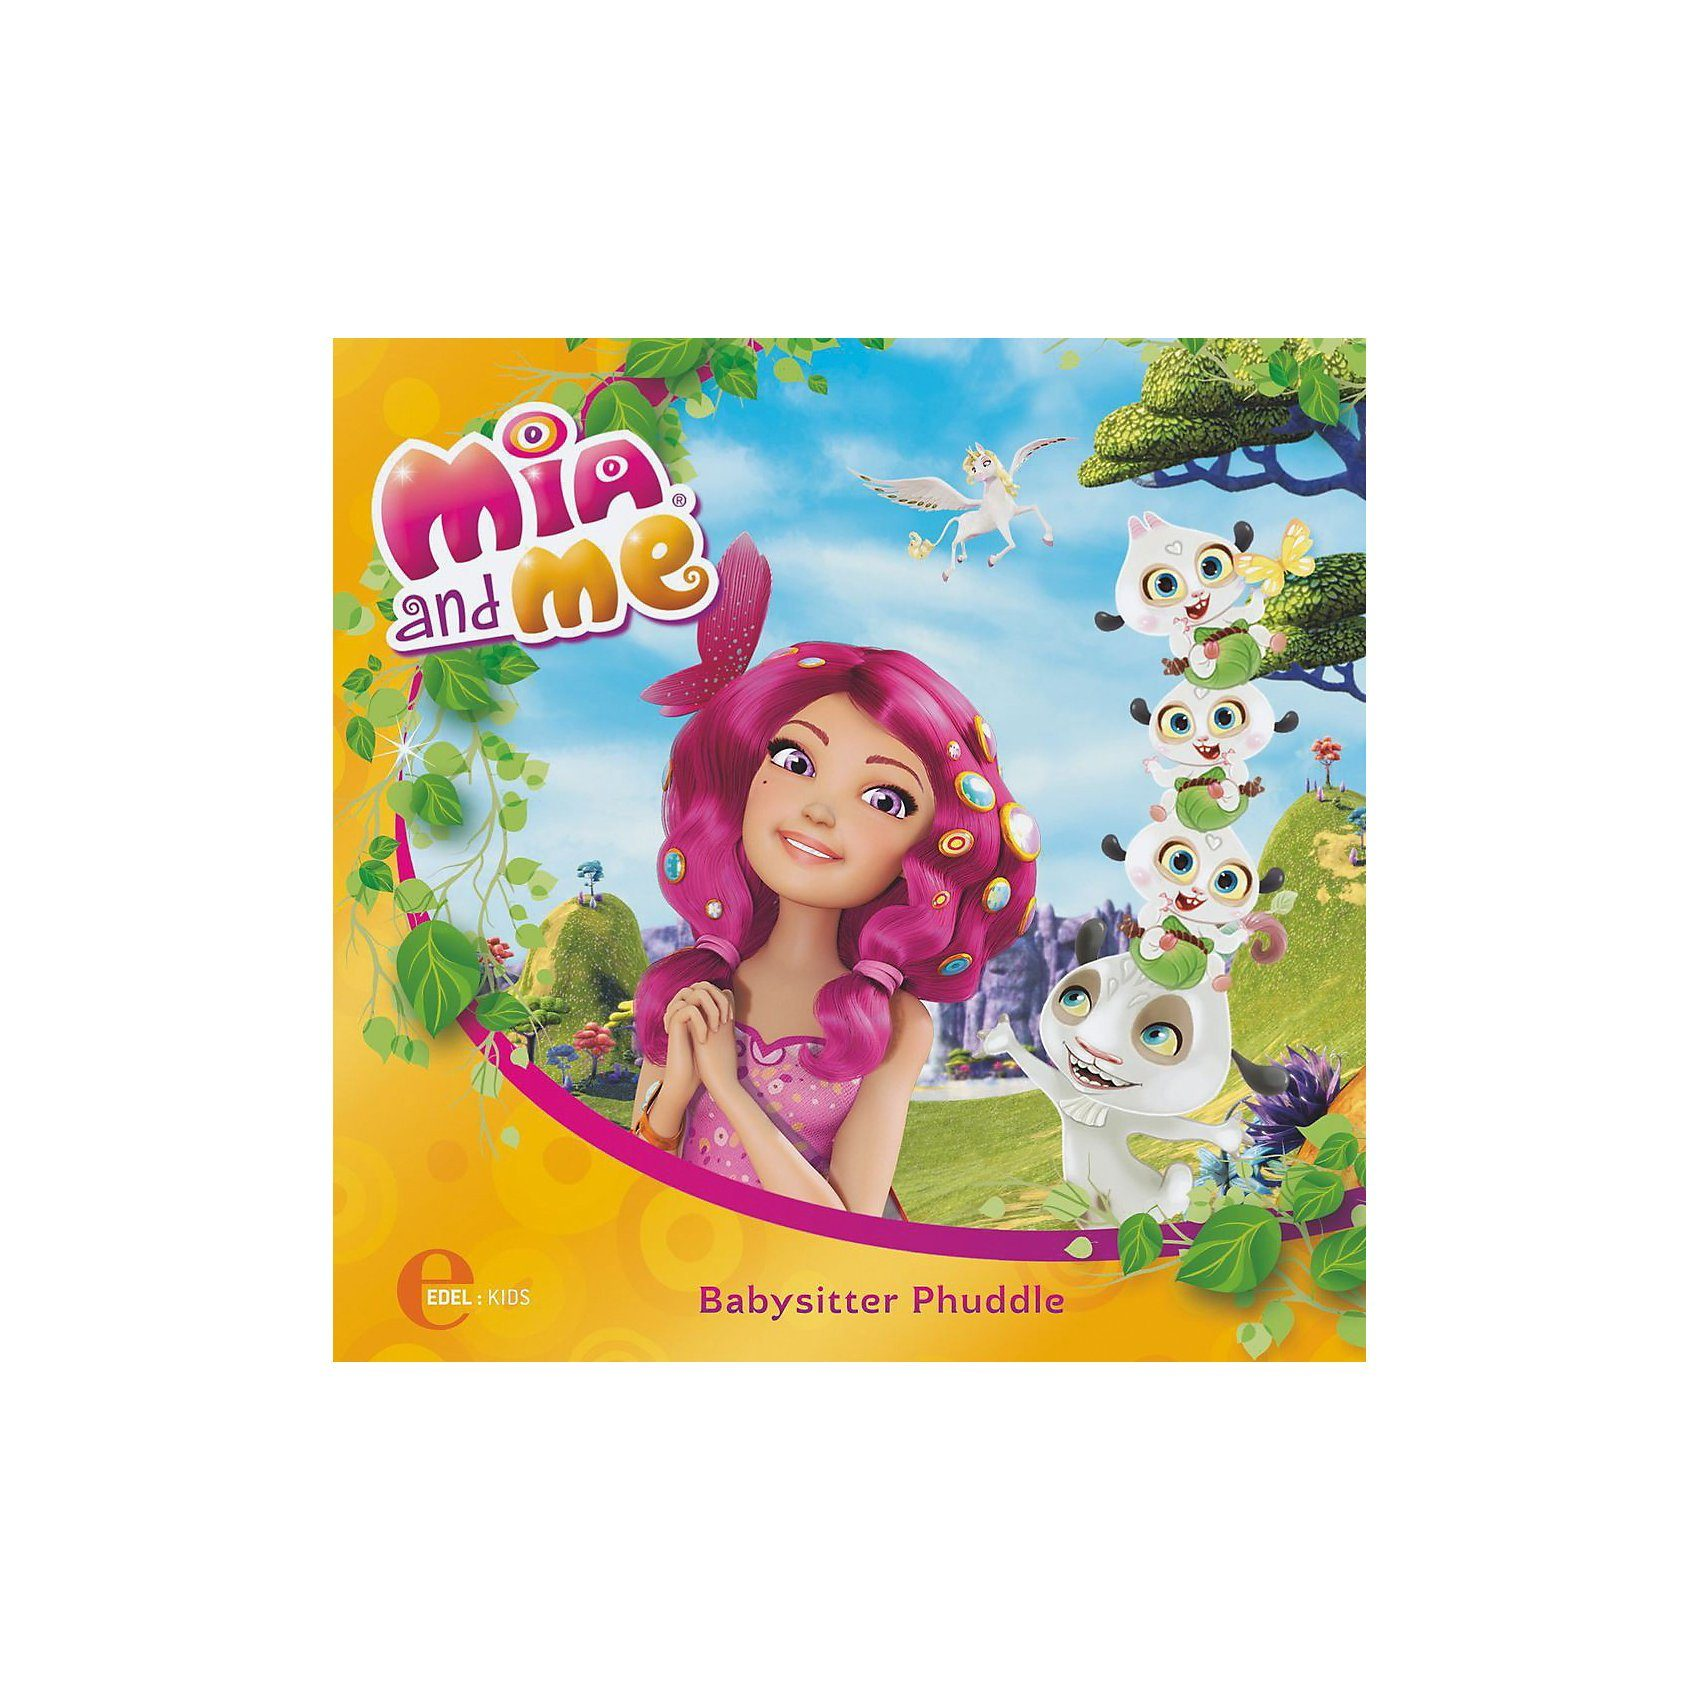 Edel CD Mia And Me 01 - Babysitter Phuddle